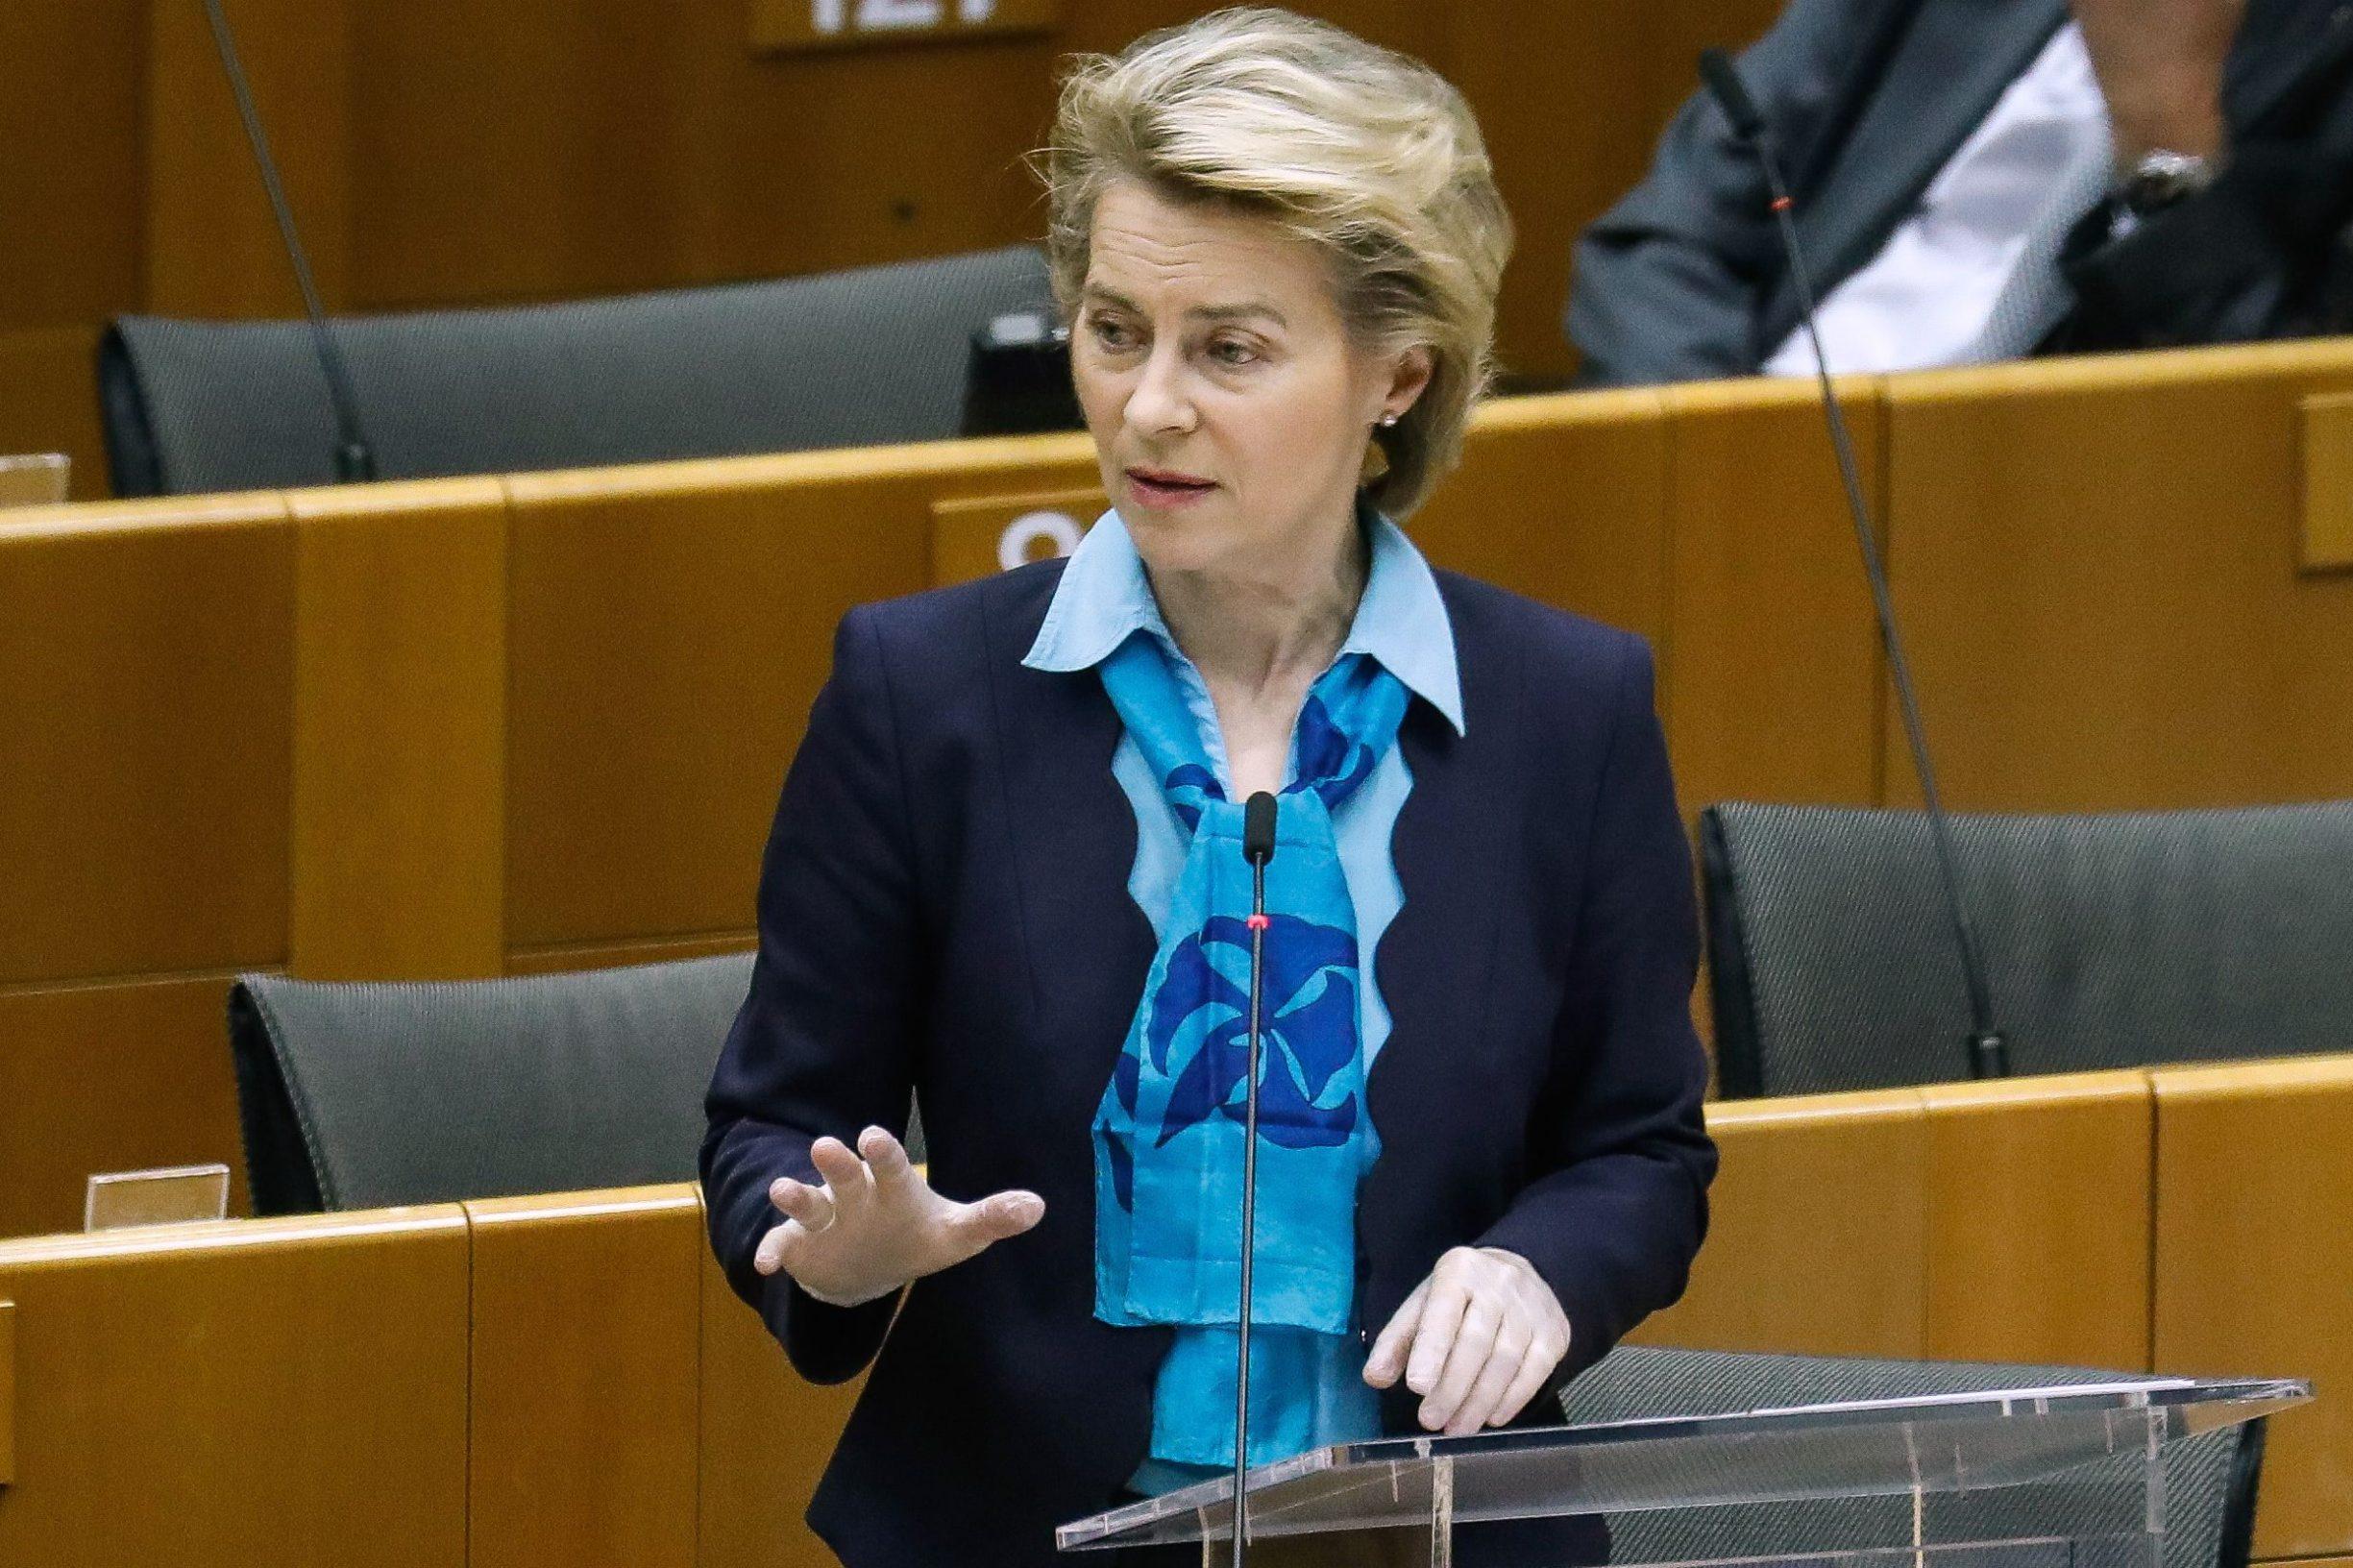 Predsjednica Europske komisije Ursula von der Leyen u Europskom parlamentu